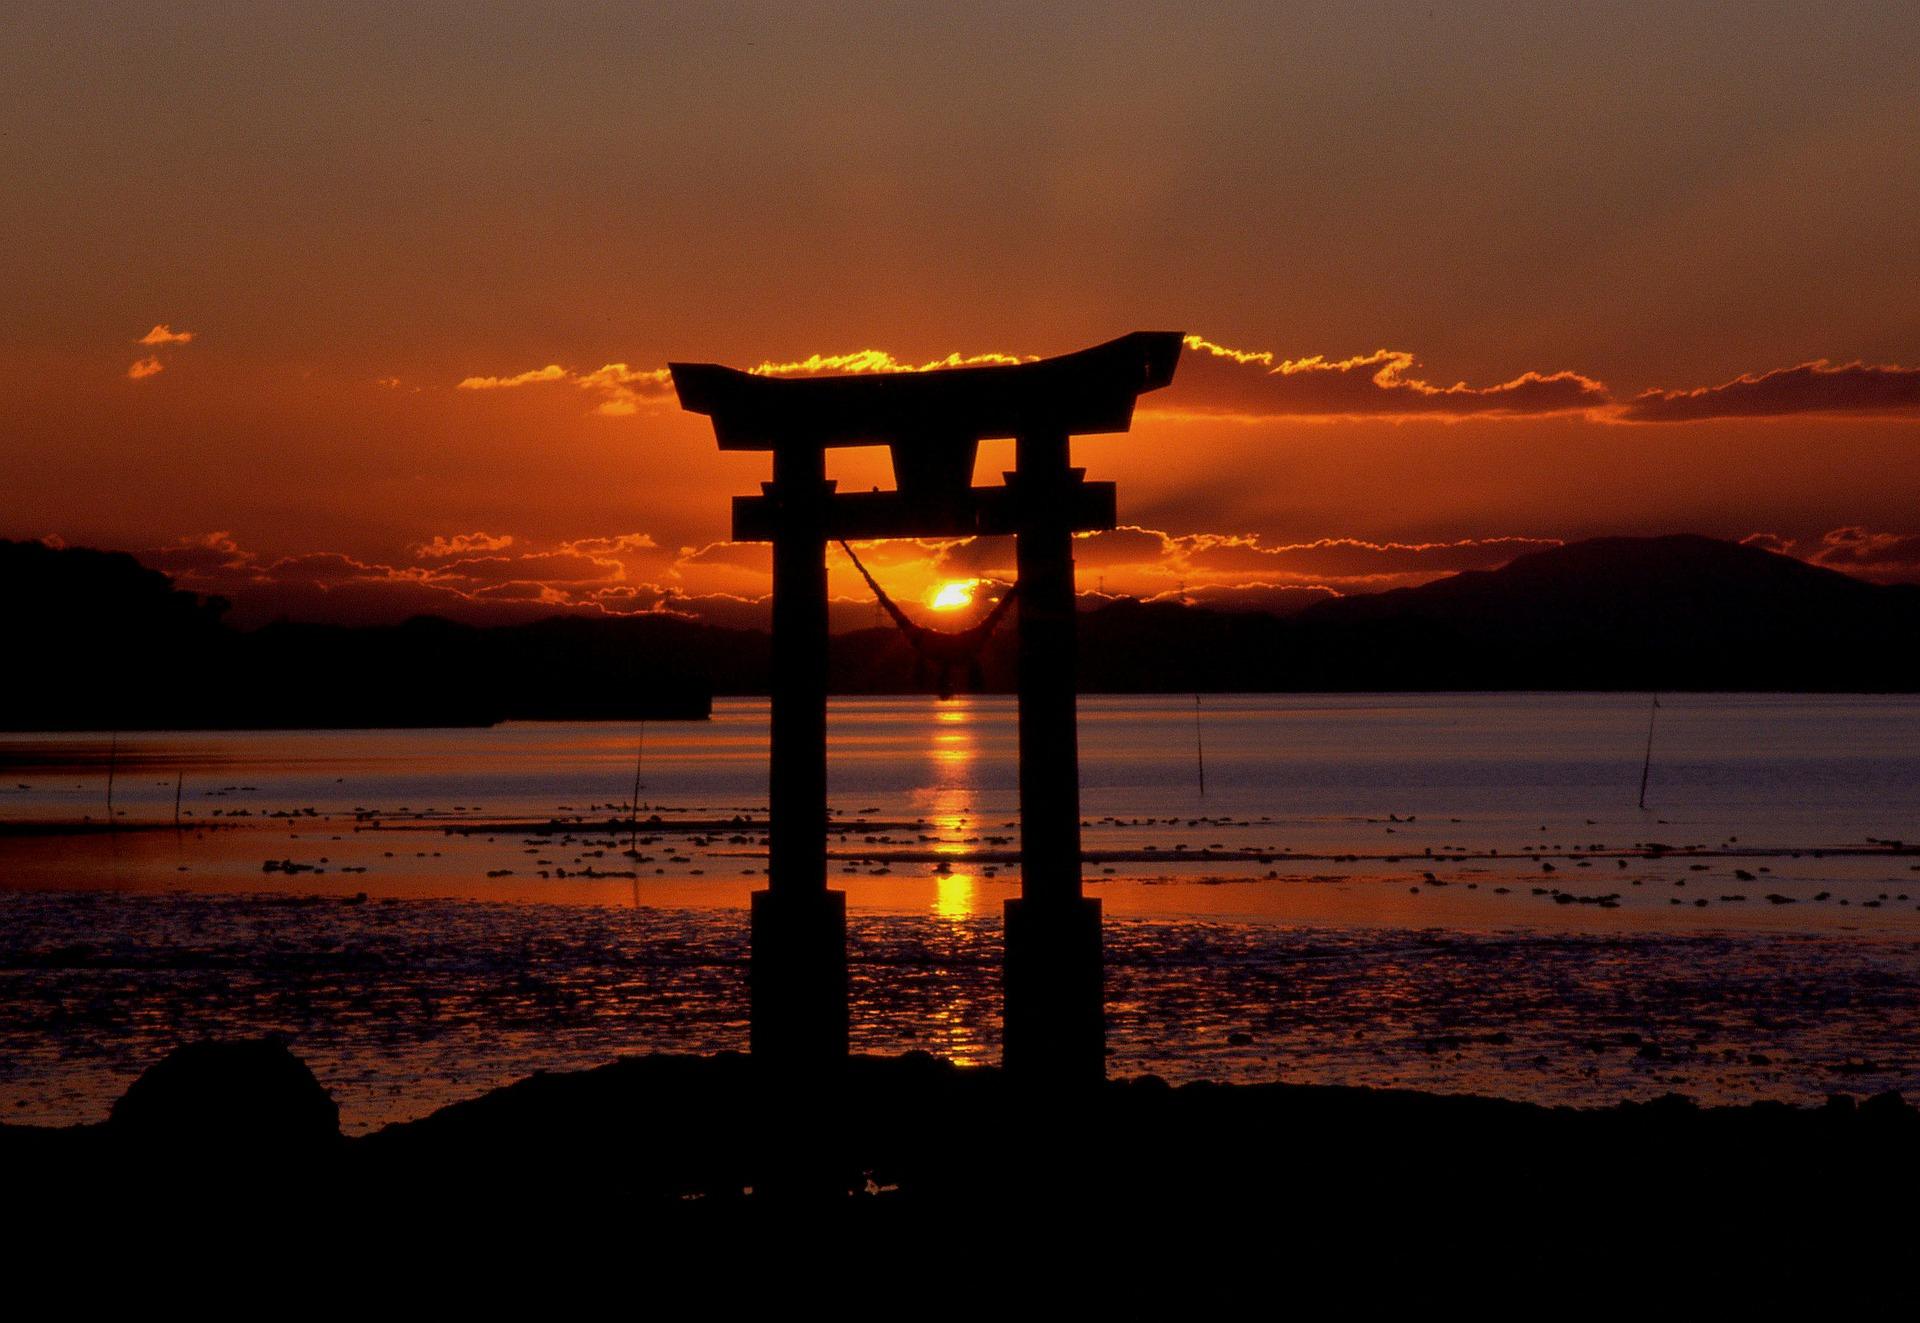 Viaje de novios espectacular Atardecer Japón Bali